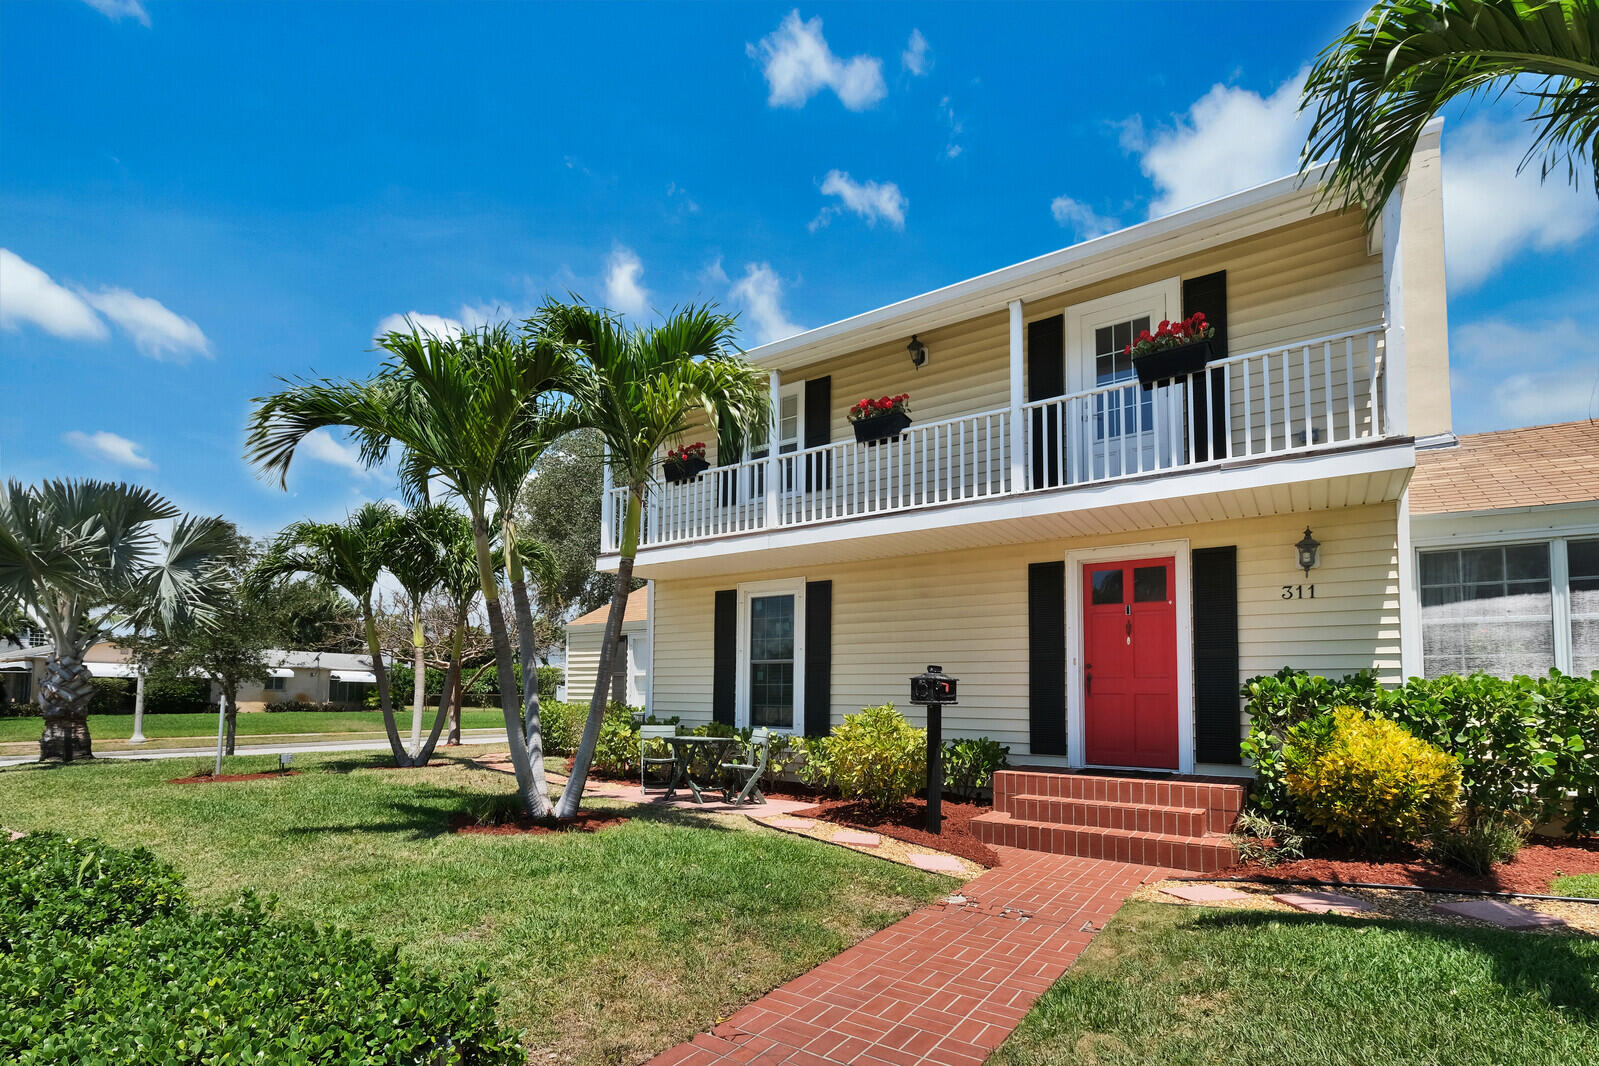 311 Colonial Road, West Palm Beach, FL 33405